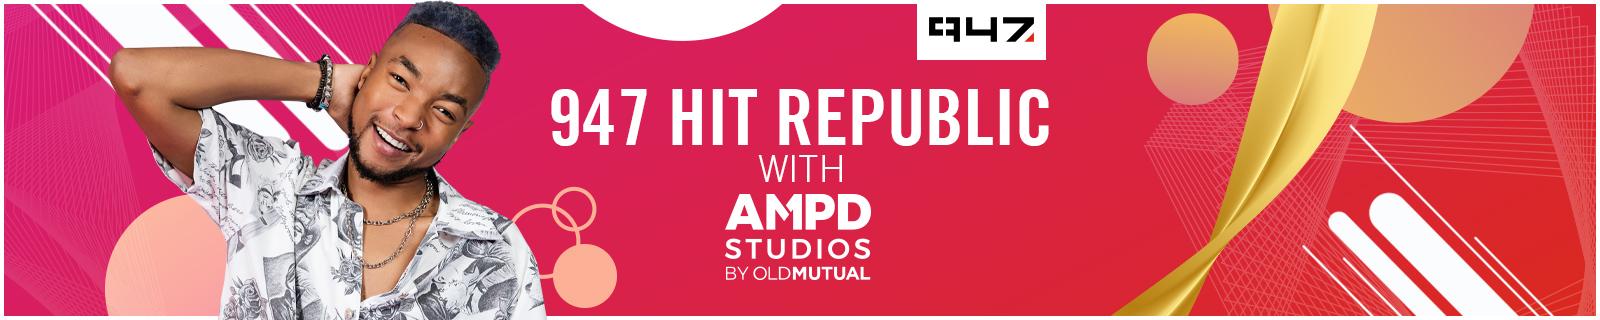 947-hitrepublic-with-ampd-banner-1600x320-01jpg